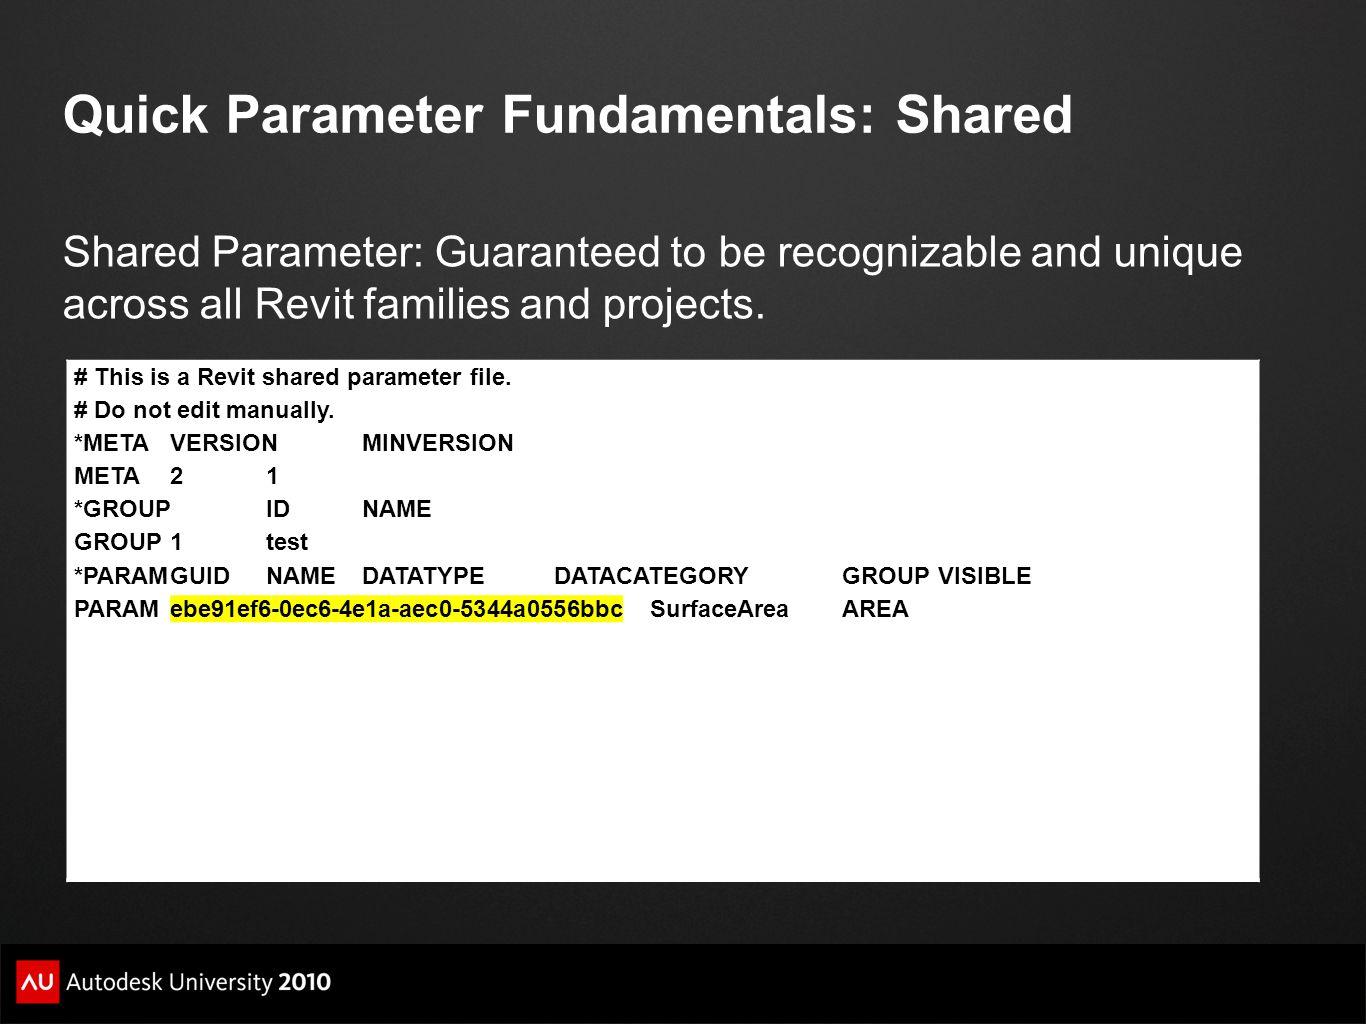 Quick Parameter Fundamentals: Shared